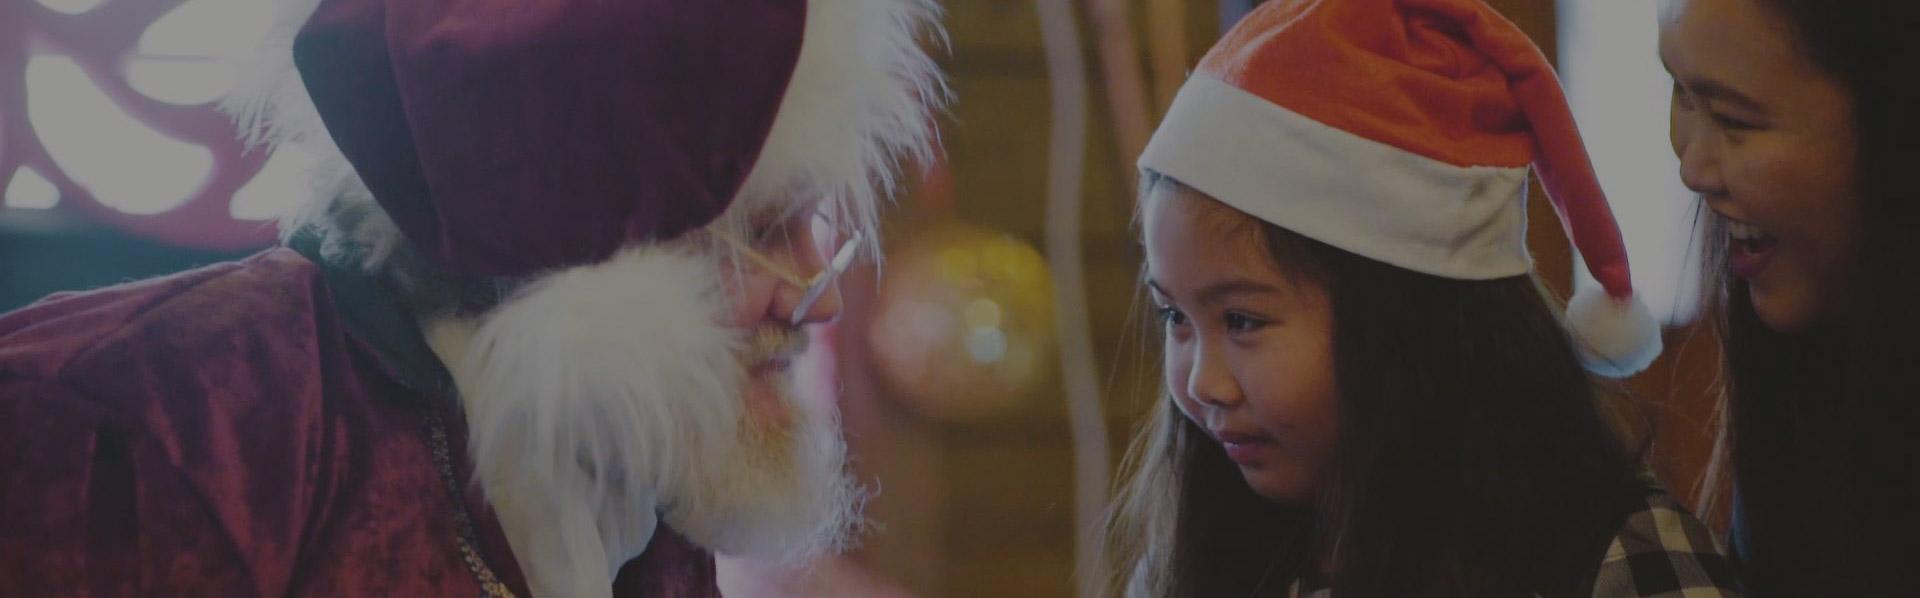 Visit Leeds Christmas Film 2017